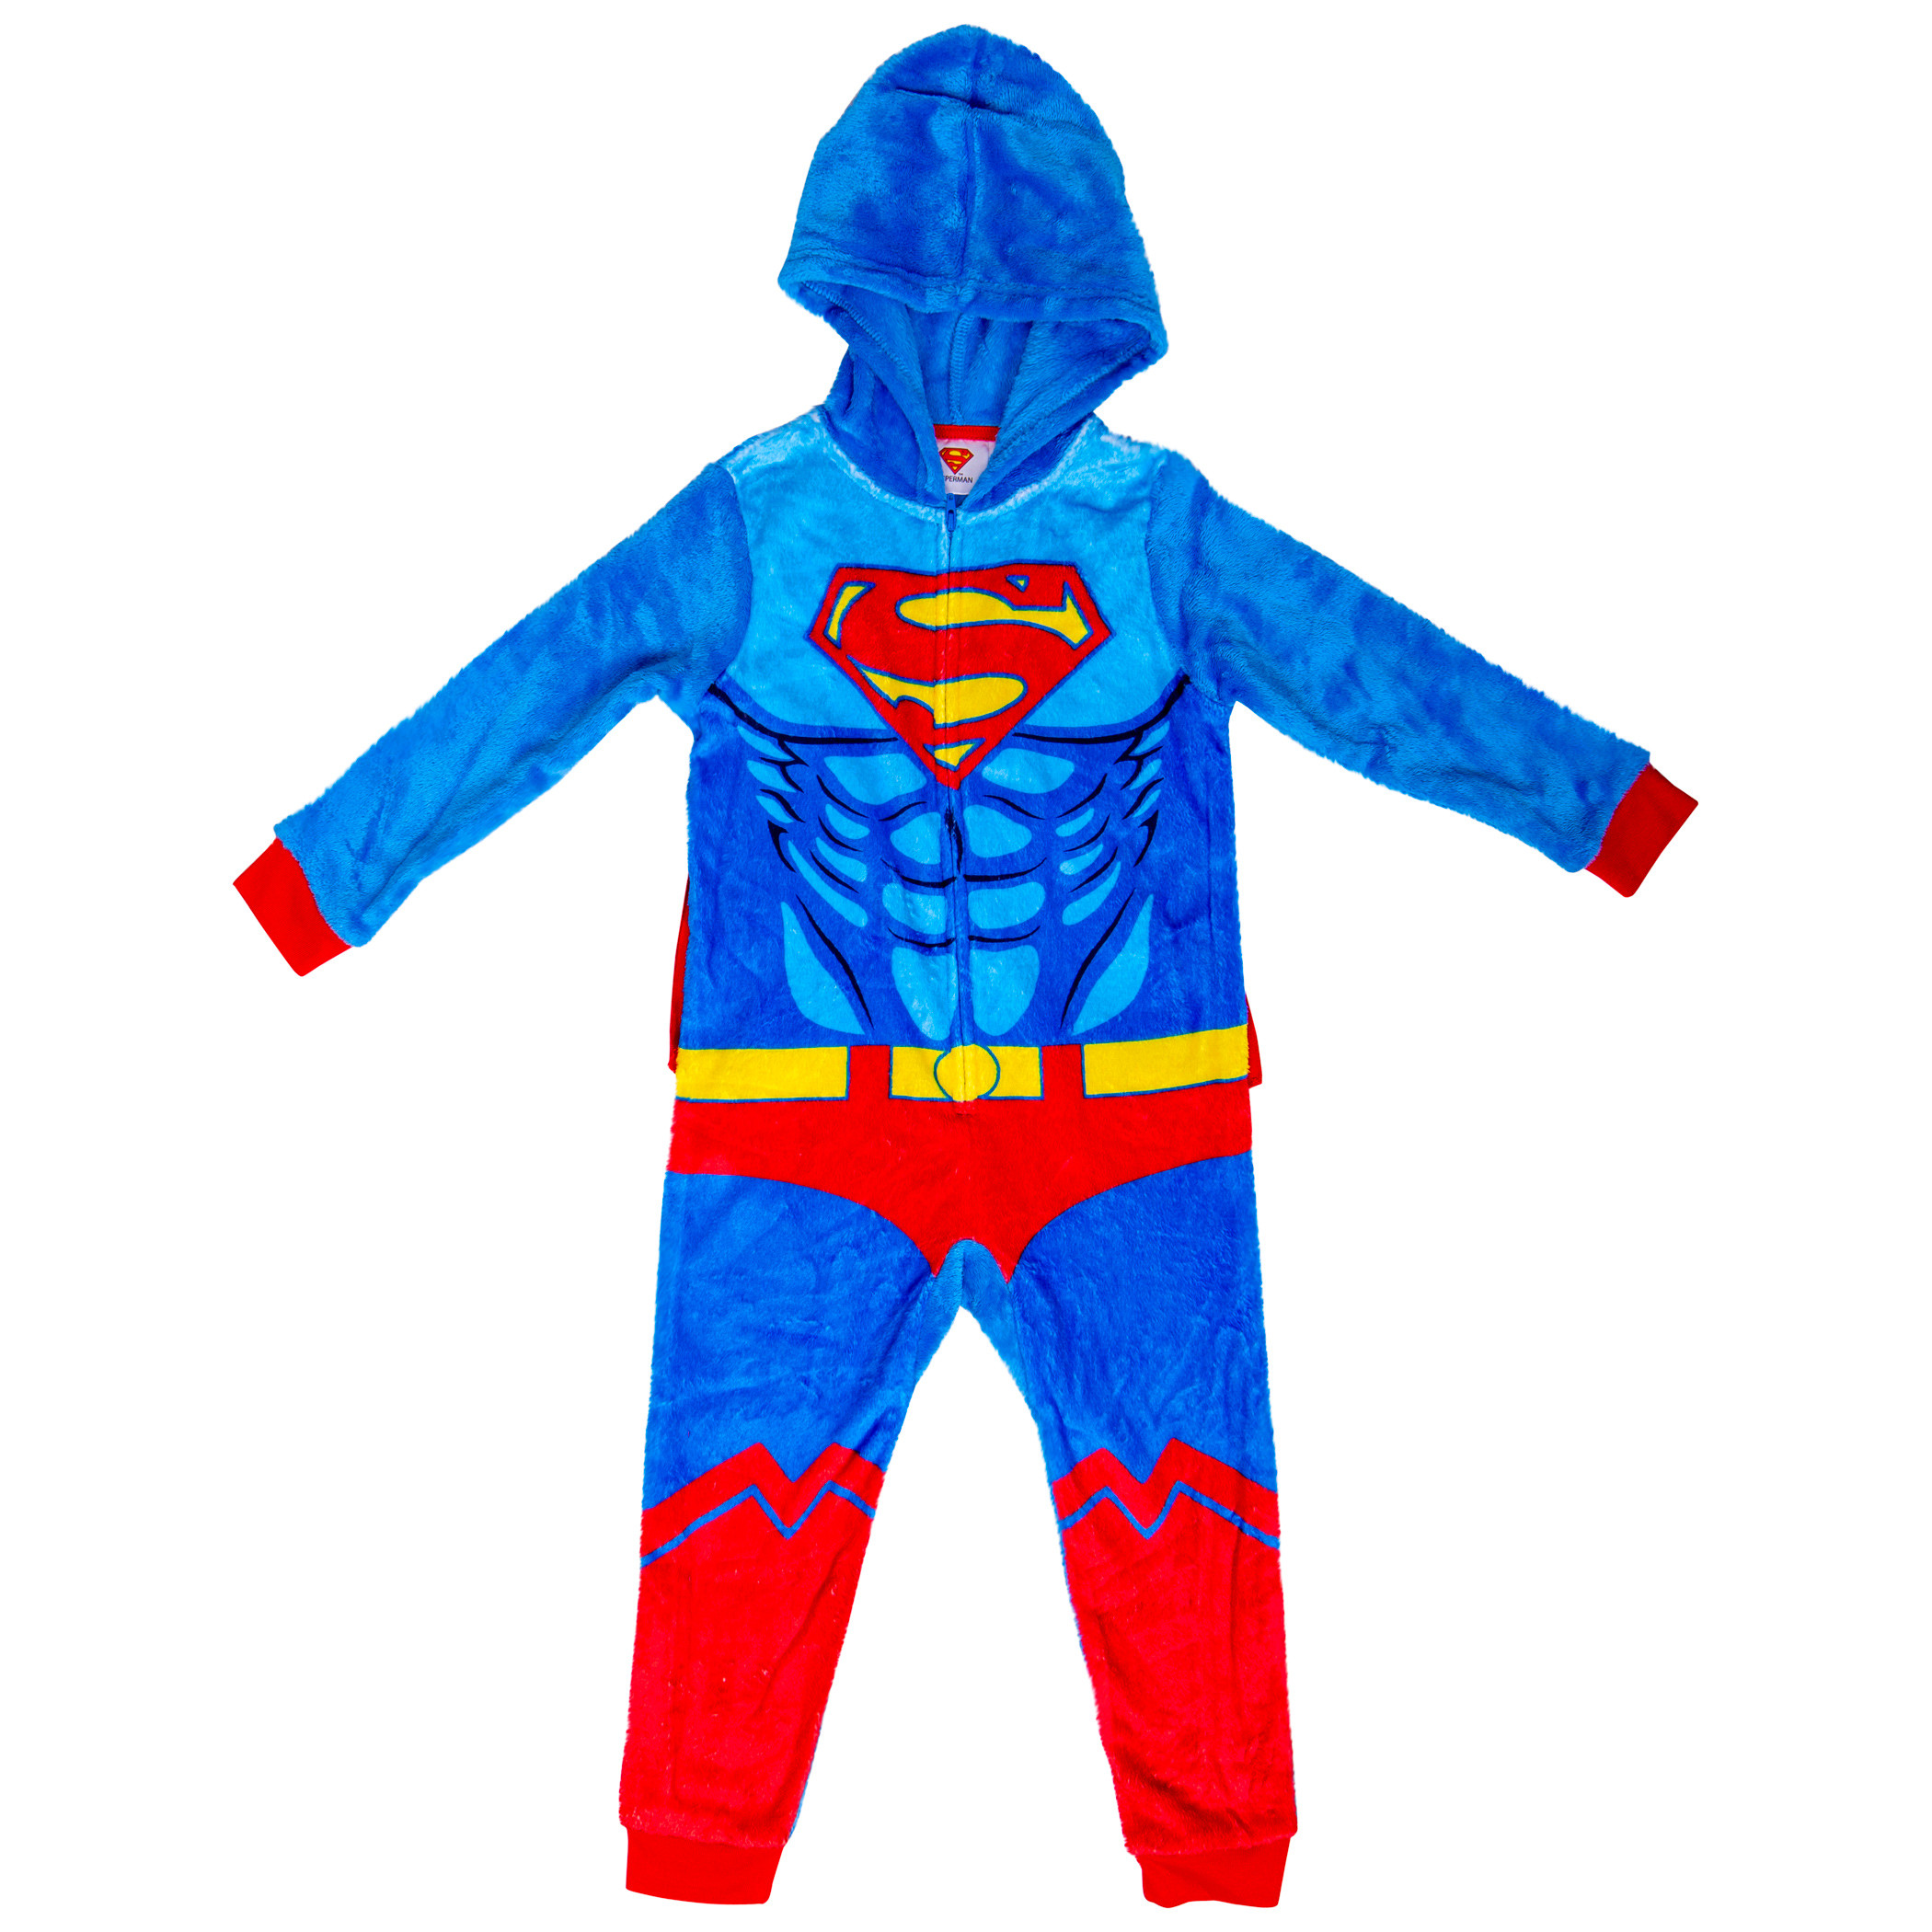 Superman Costume Kids Union Suit with Removable Velcro Cape